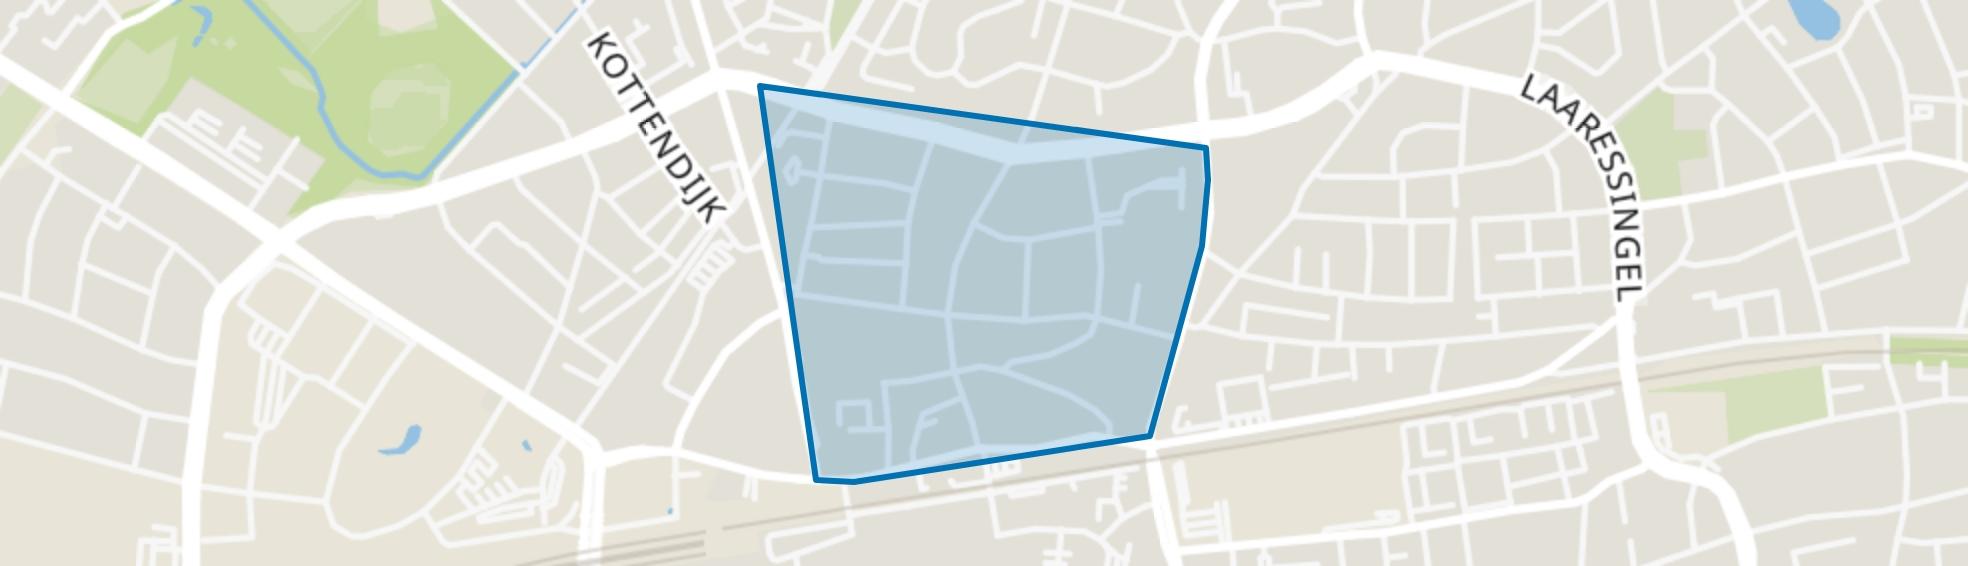 Lasonder, Zeggelt, Enschede map